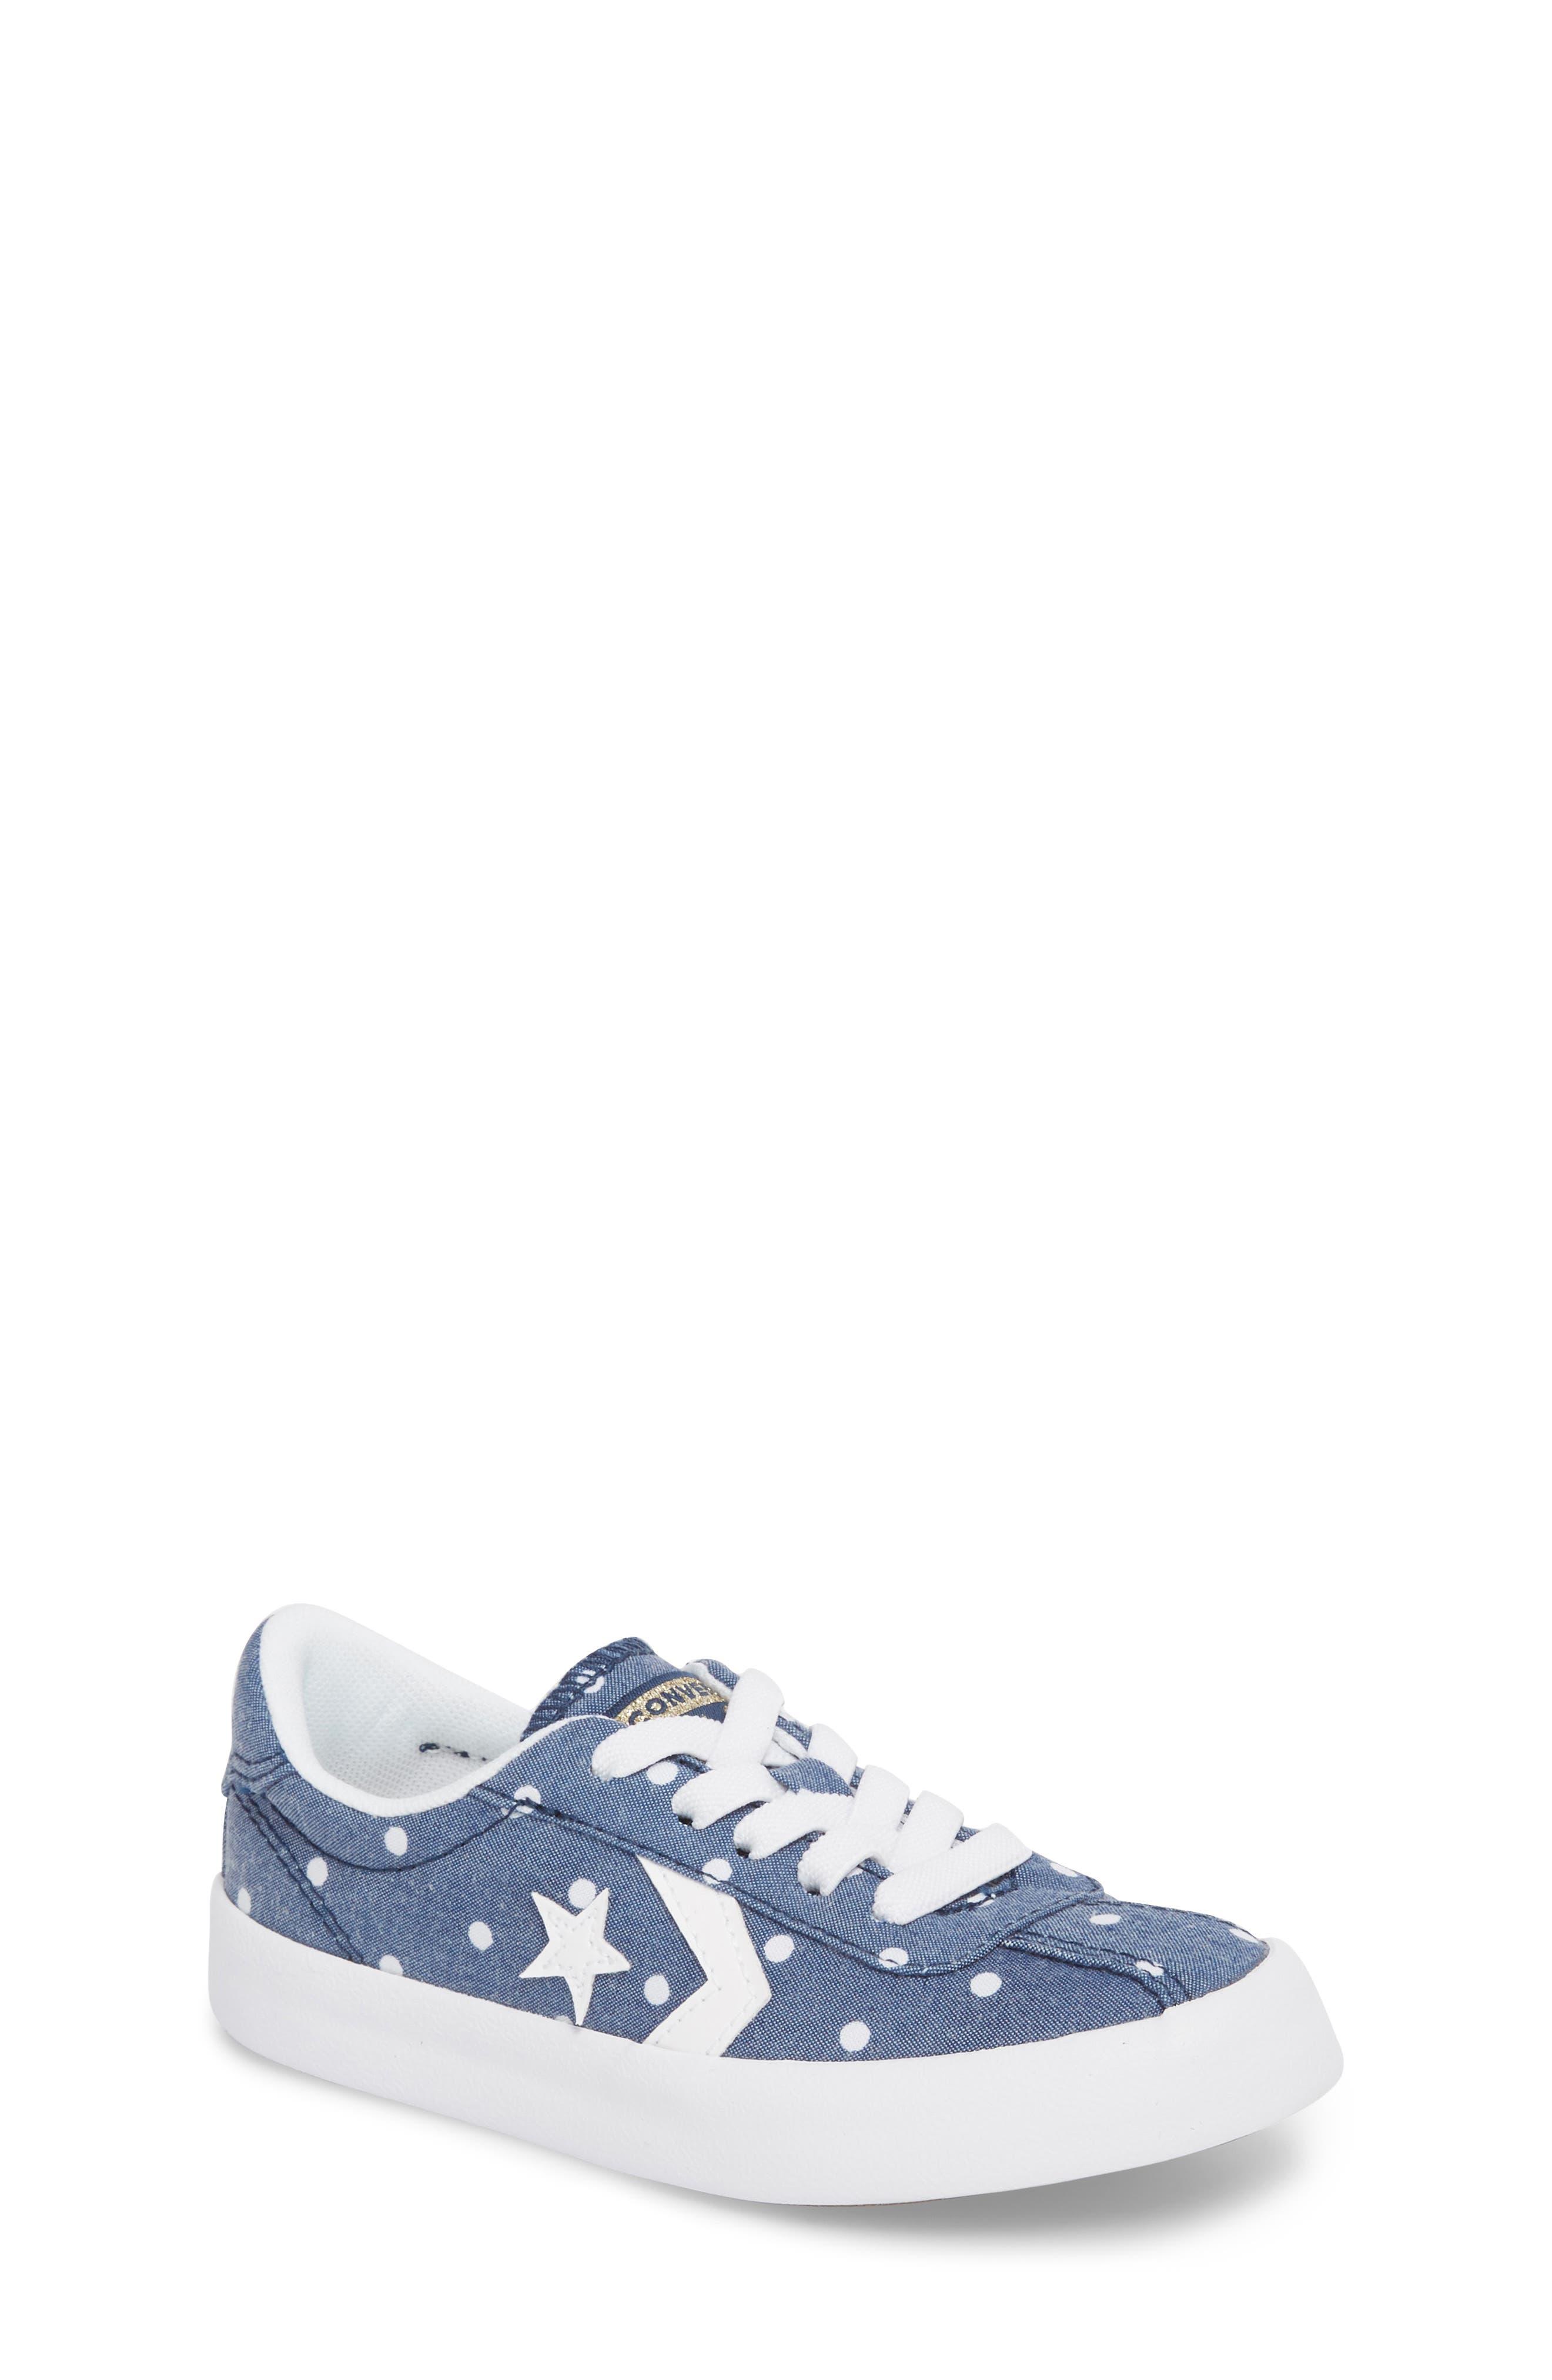 Breakpoint Polka Dot Sneaker,                         Main,                         color, 426